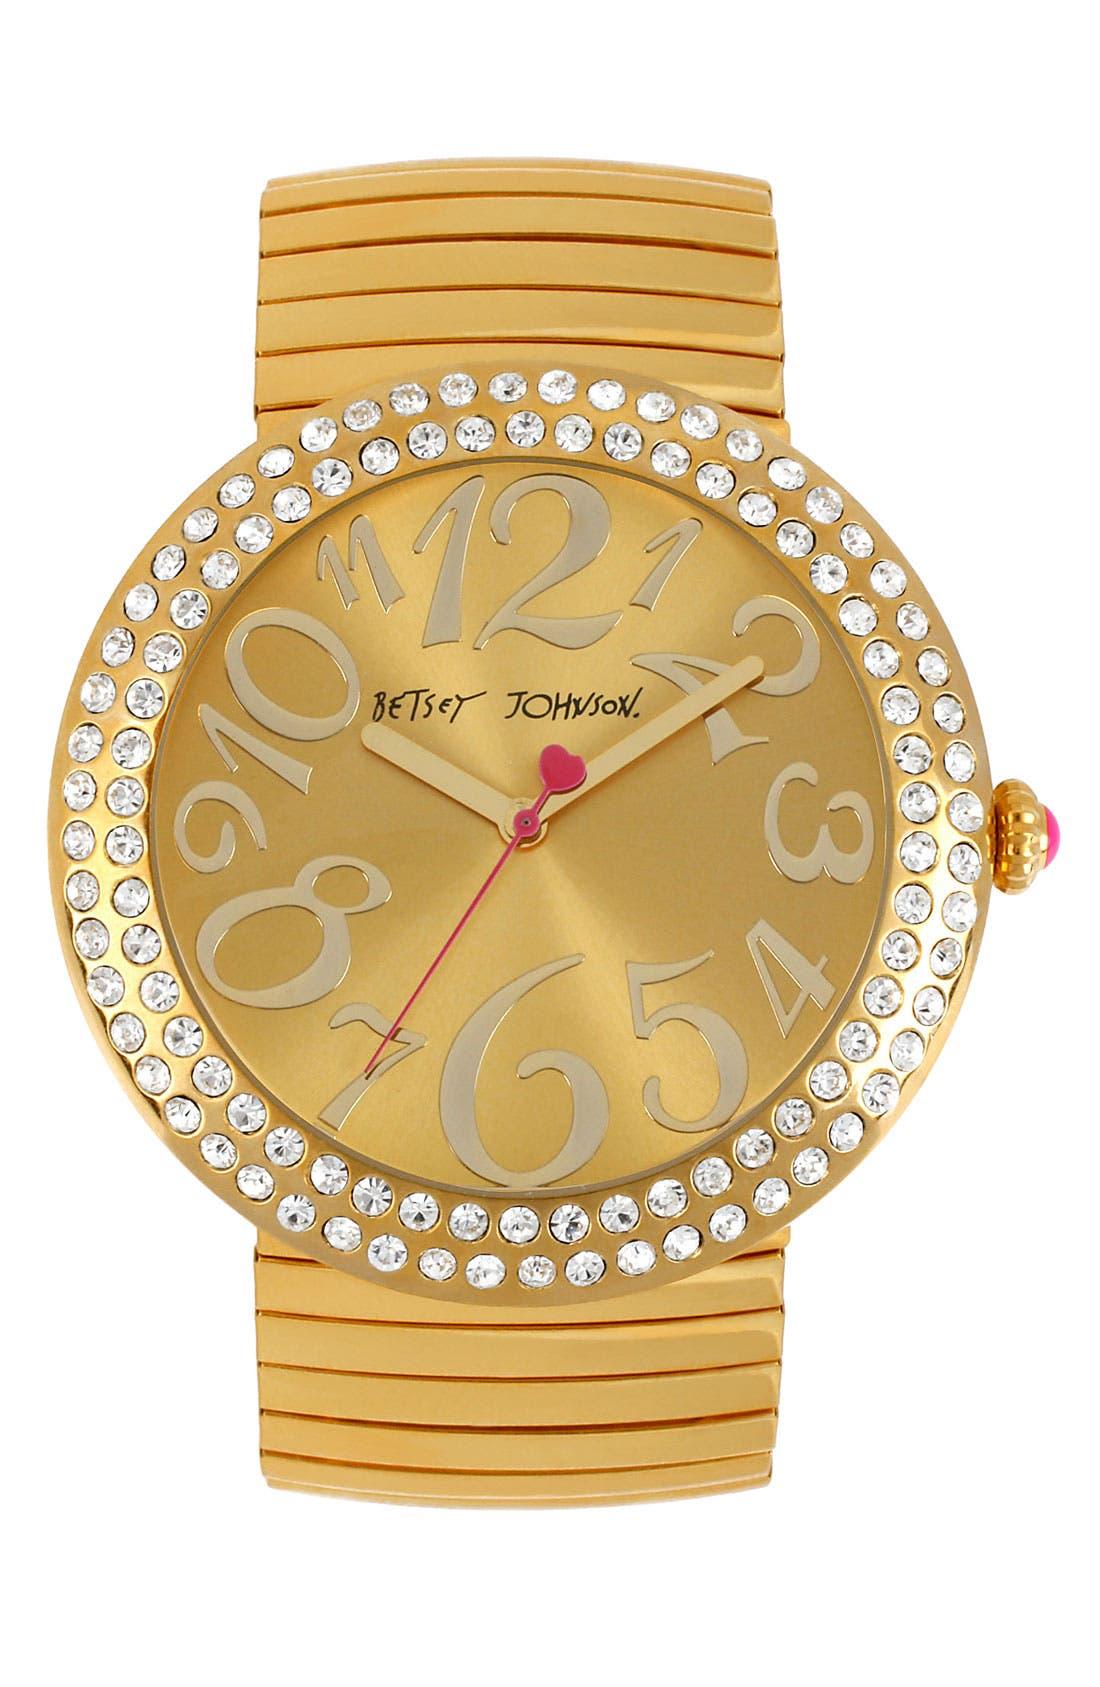 Main Image - Betsey Johnson Crystal Bezel Watch, 50mm